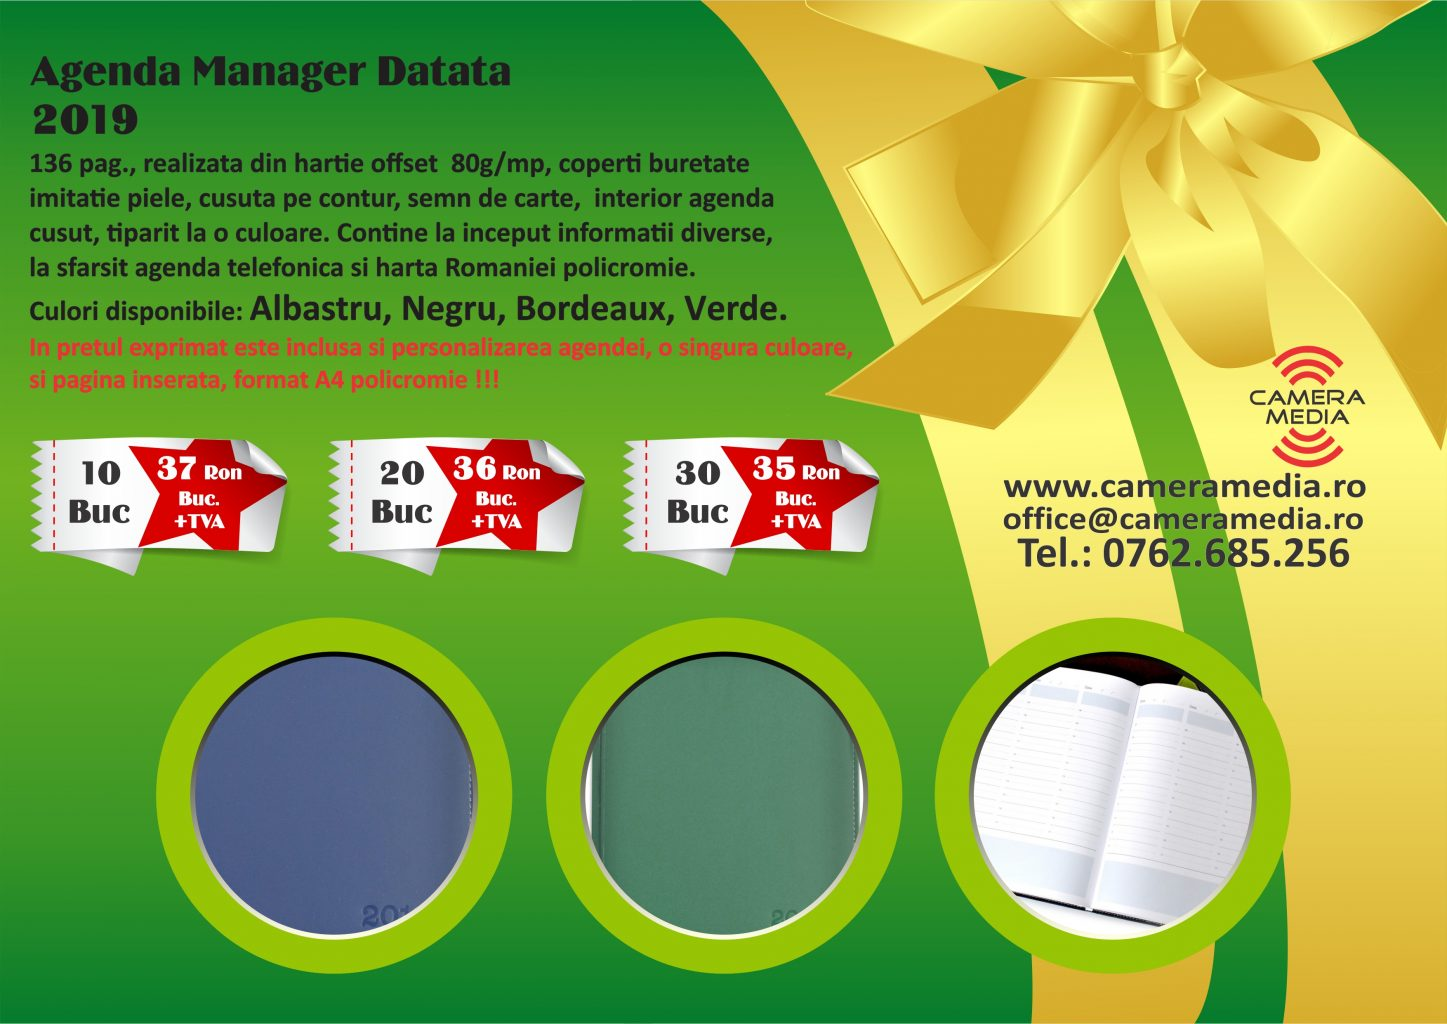 Agenda Manager Datata Personalizata 2019 Craiova Tiparituri Craiova Promotionale Craiova Calendare Personalizate Craiova 2019 agende Personalizate Craiova 2019